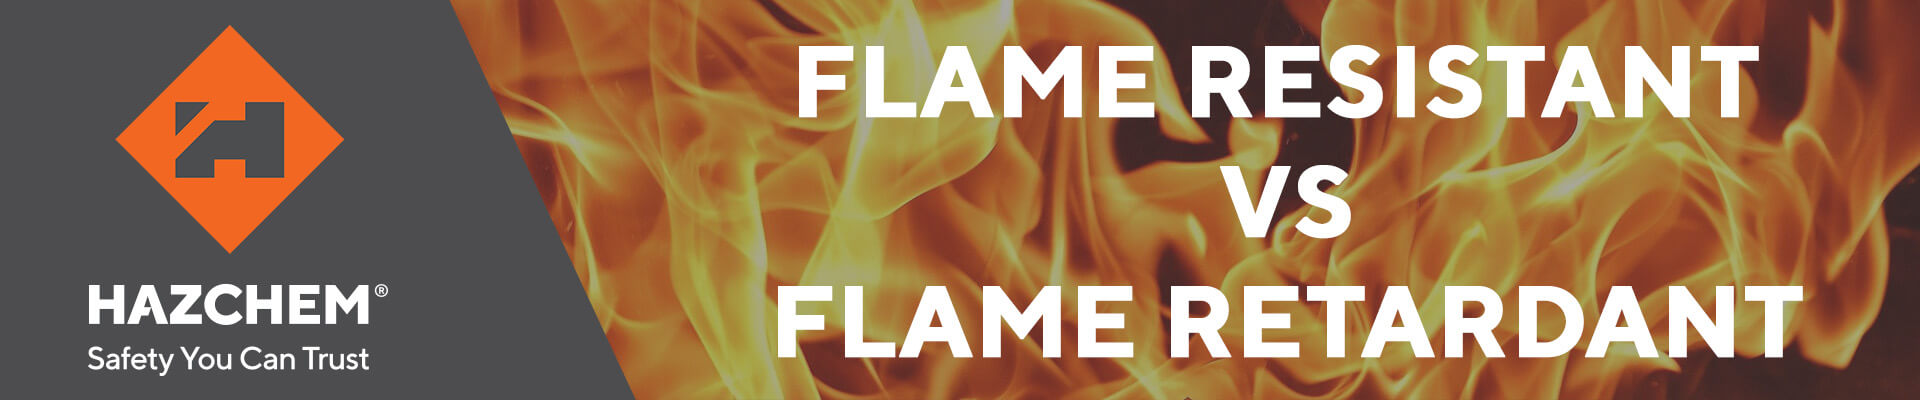 Flame Resistant vs Flame Retrardant Blog Header Image